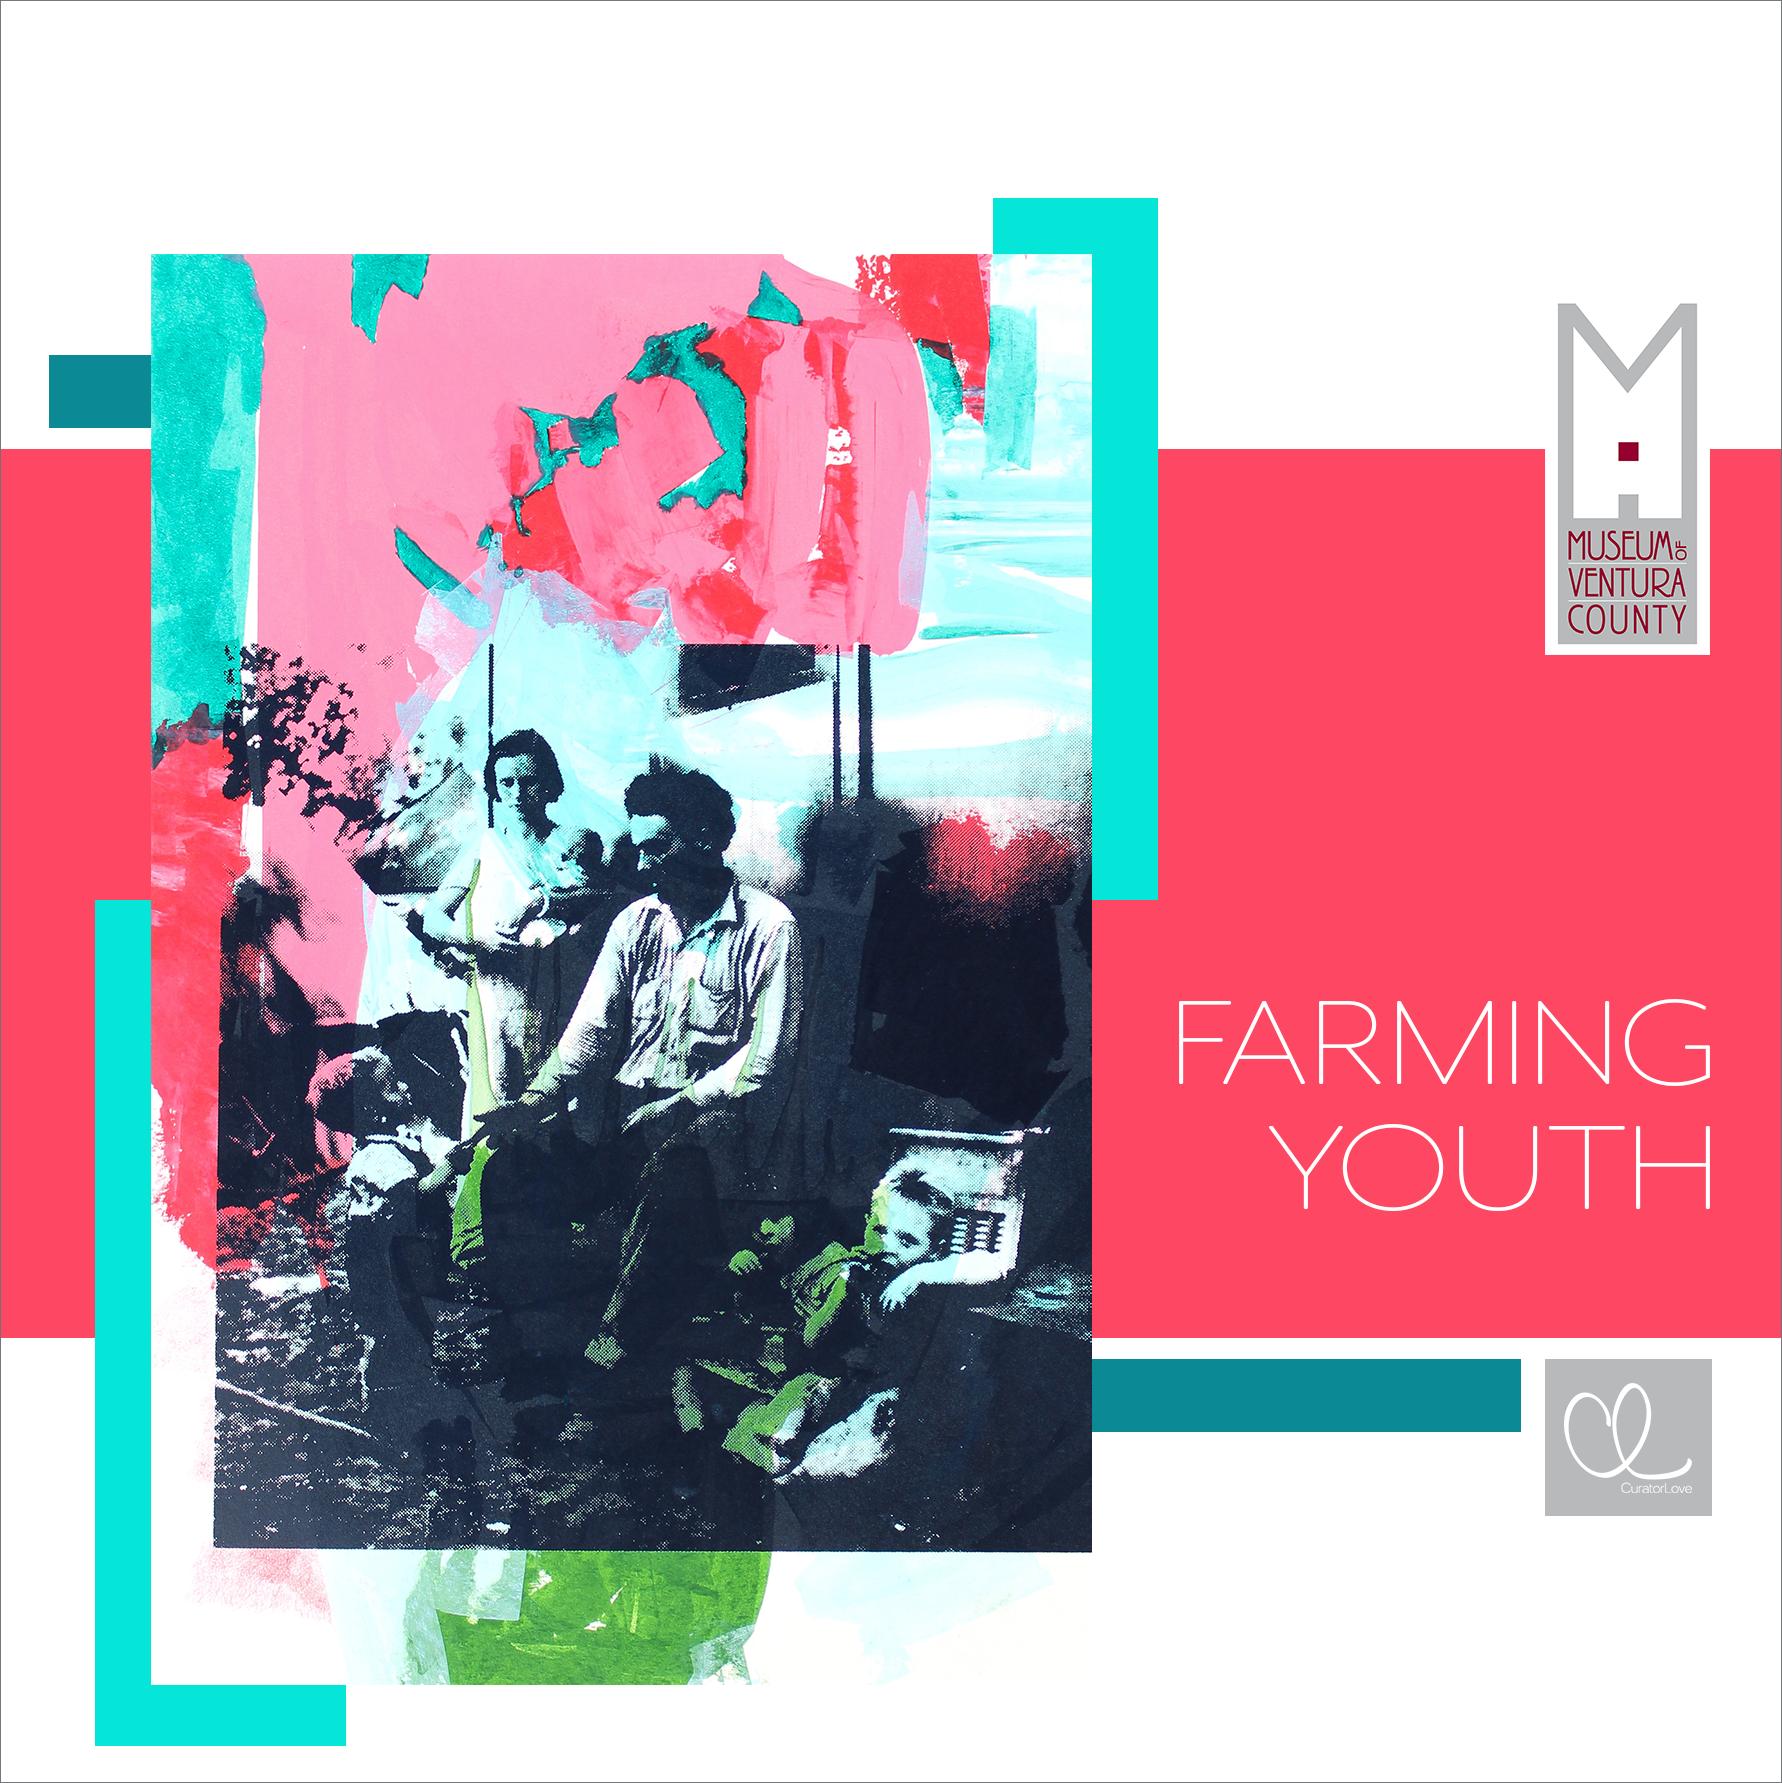 Farming Youth copy copy.png